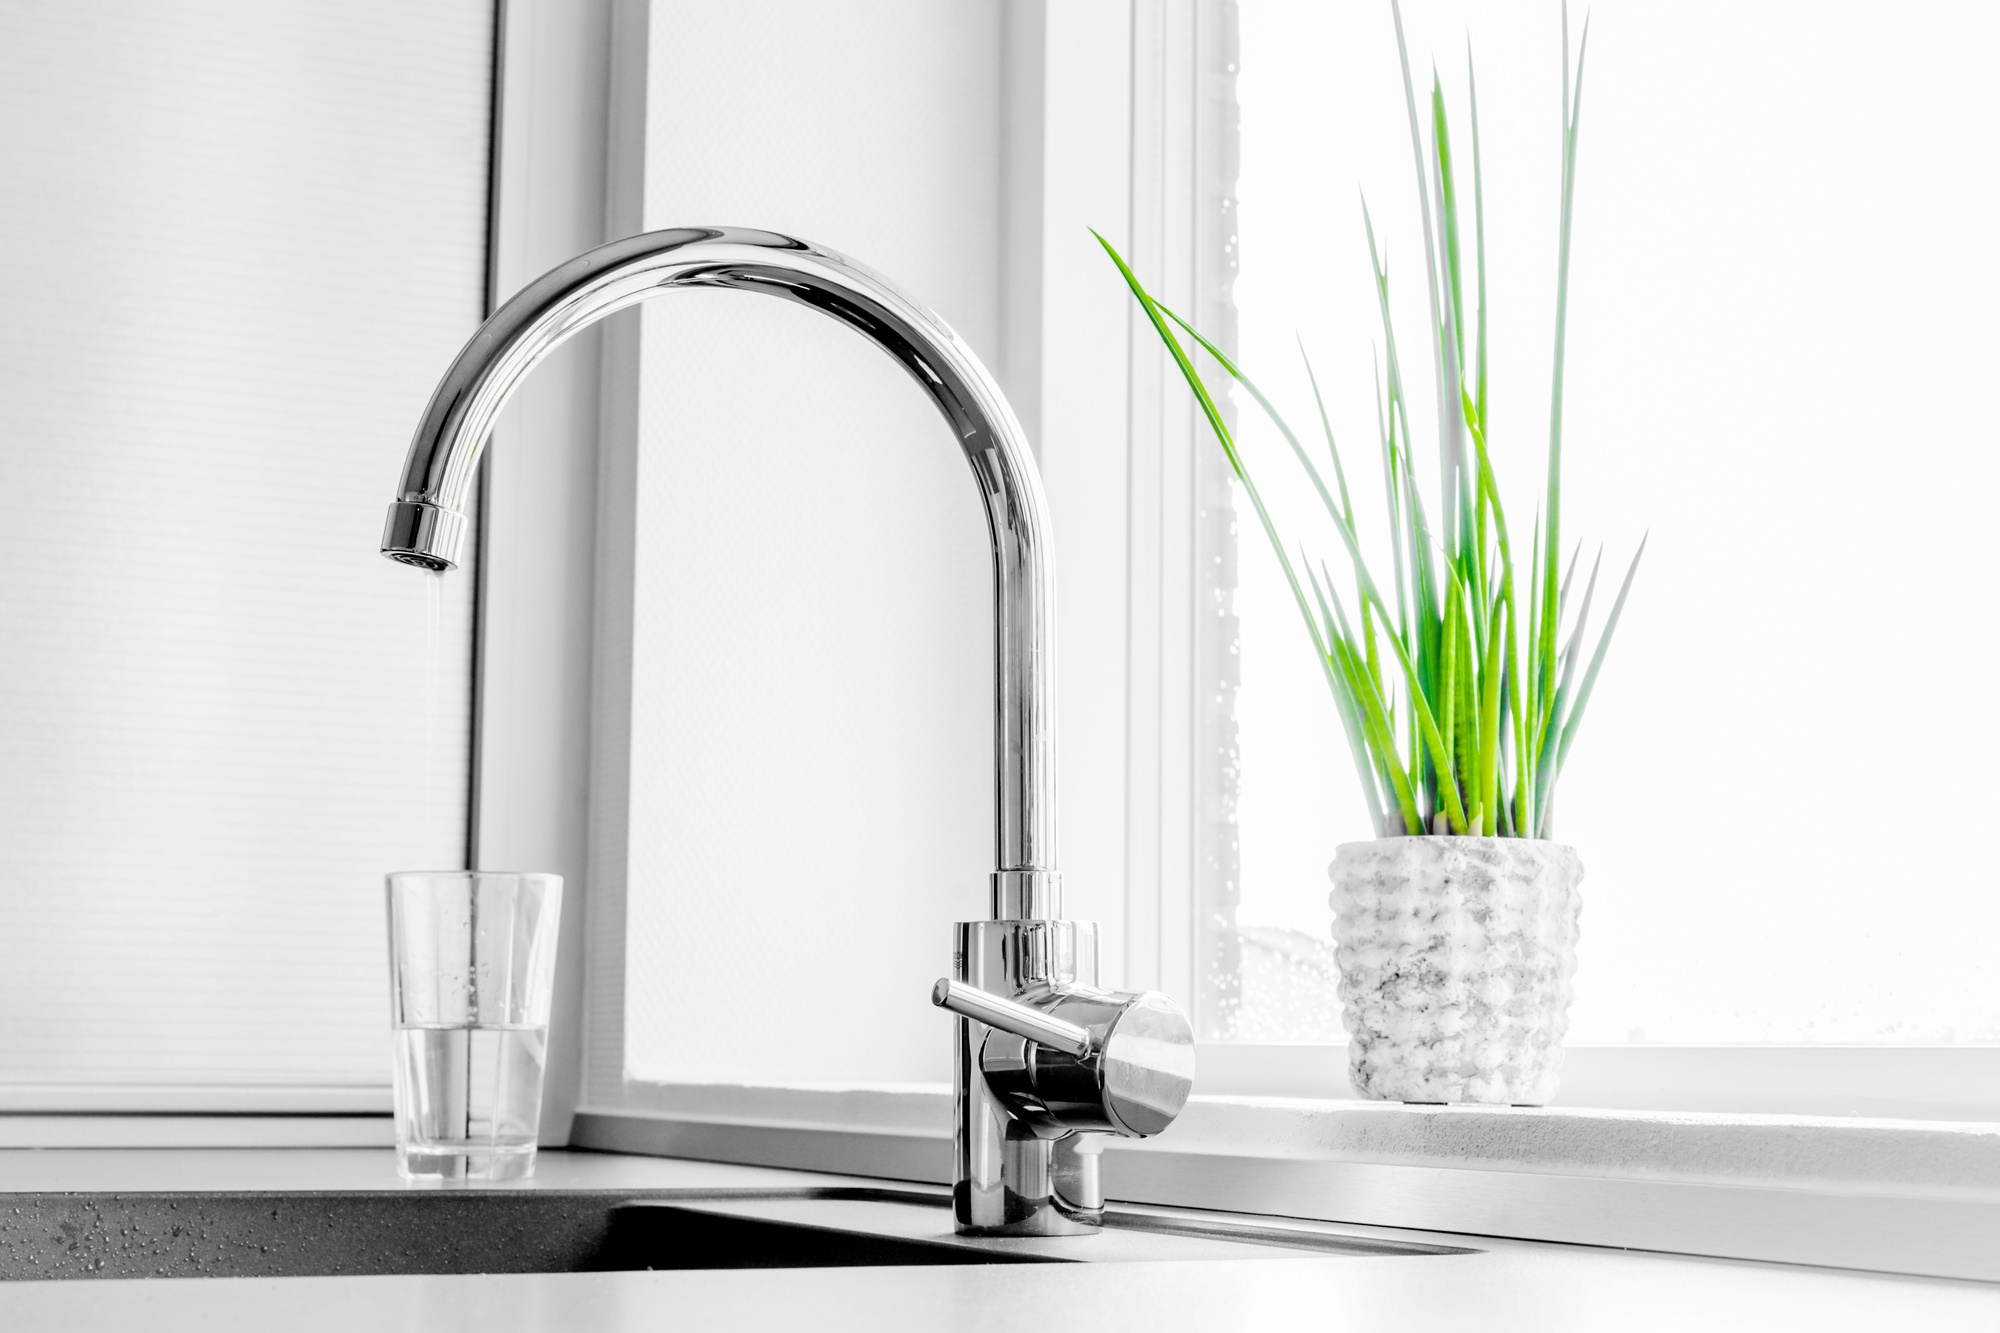 The Essential DIY Guide to Kitchen Faucet Repair - Paldrop.com